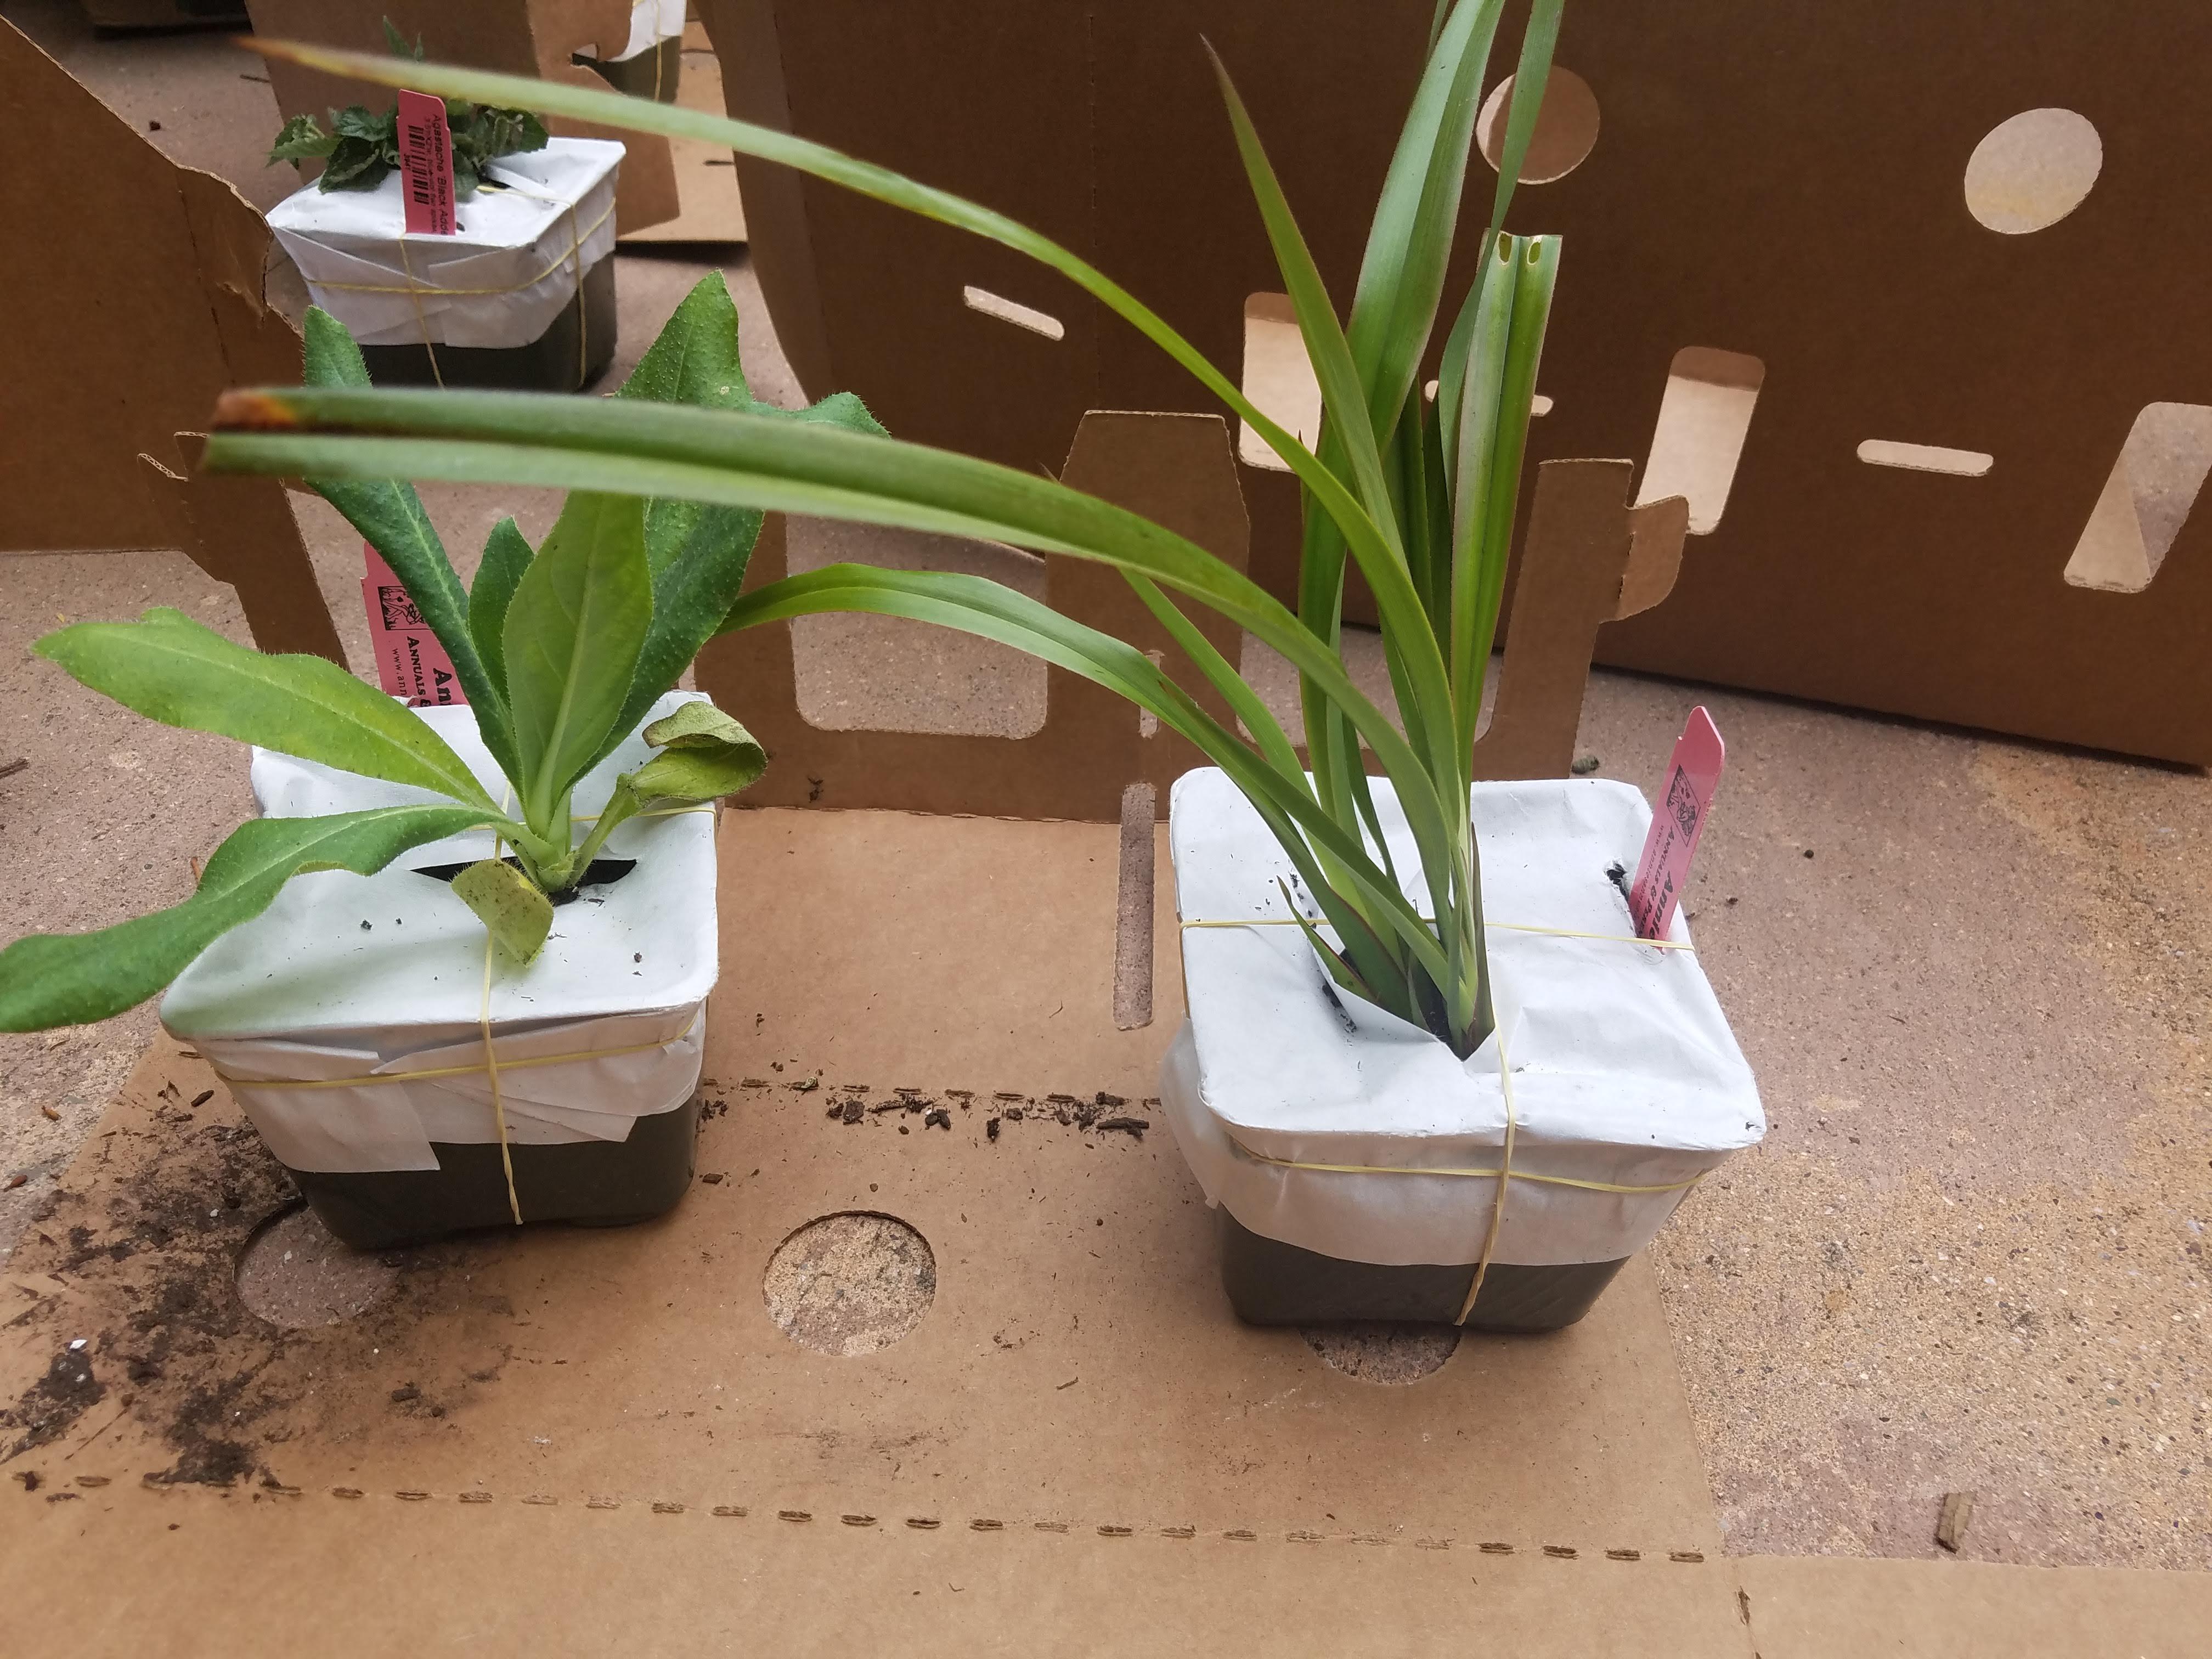 Mail-ordered seedlings